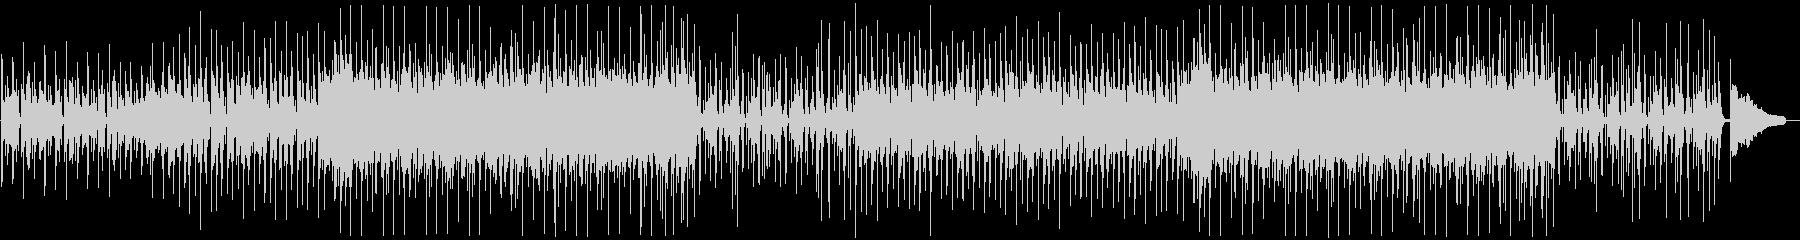 CM用8、楽しい口笛&ウクレレ・ロックAの未再生の波形